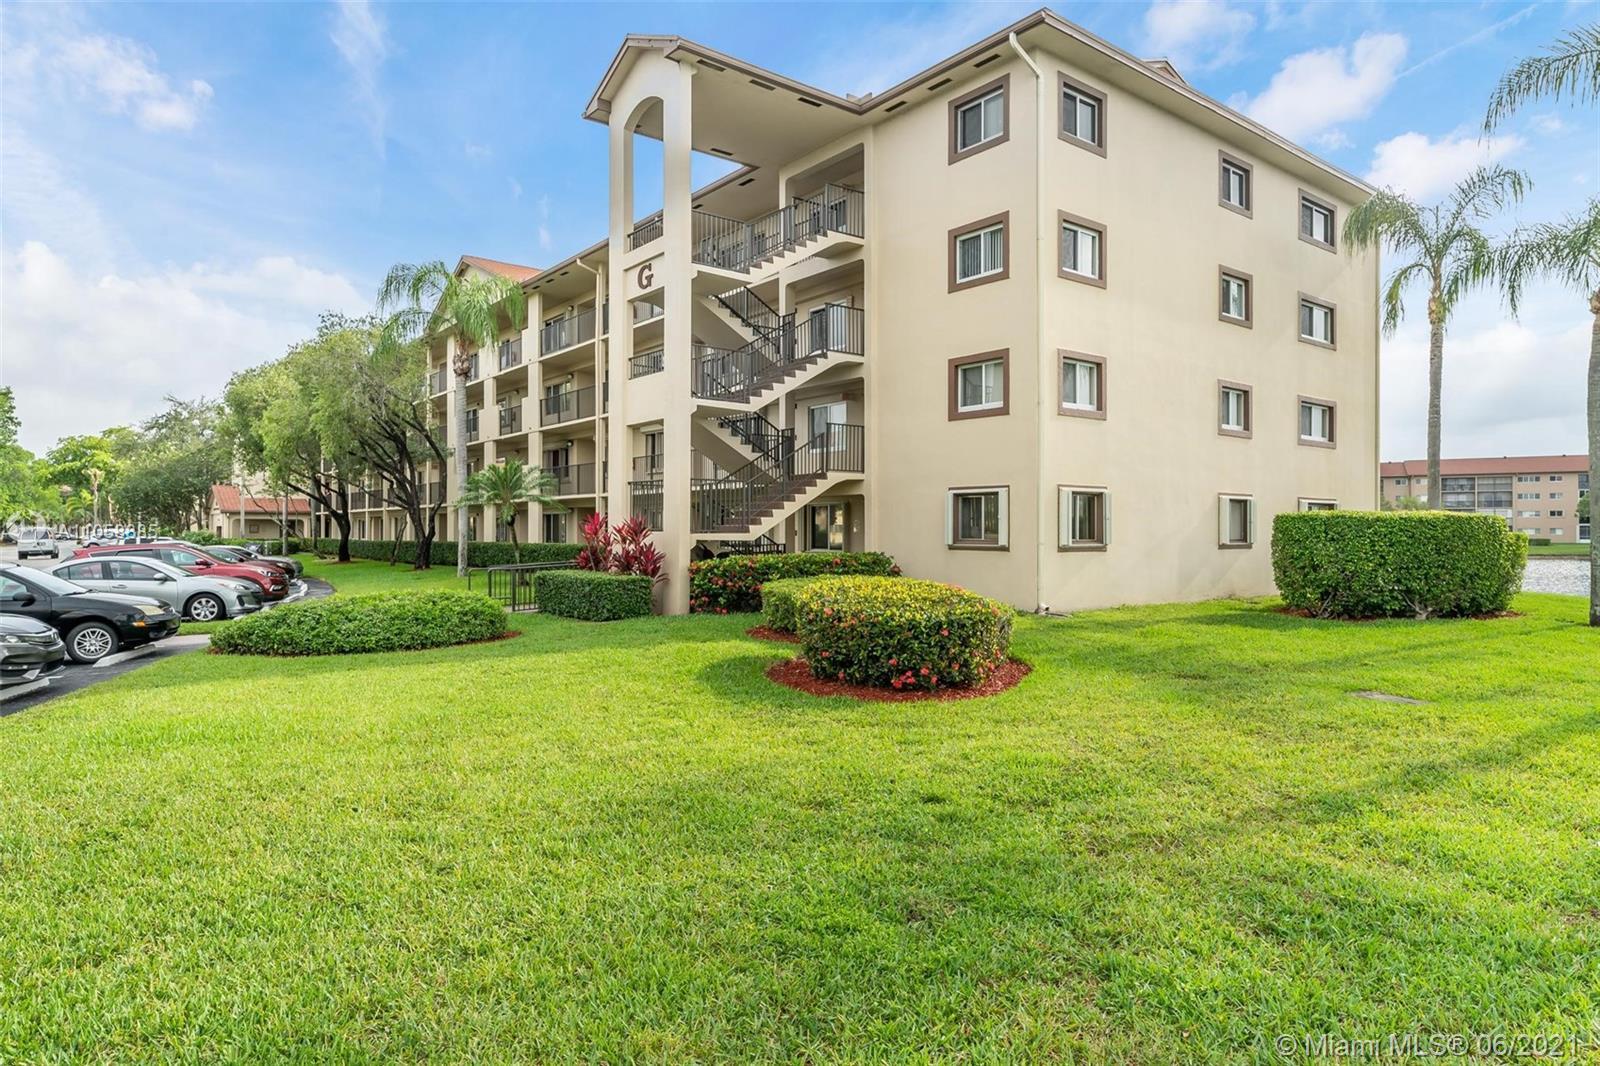 Property for sale at 1351 SW 141st Ave Unit: 208G, Pembroke Pines,  Florida 33027